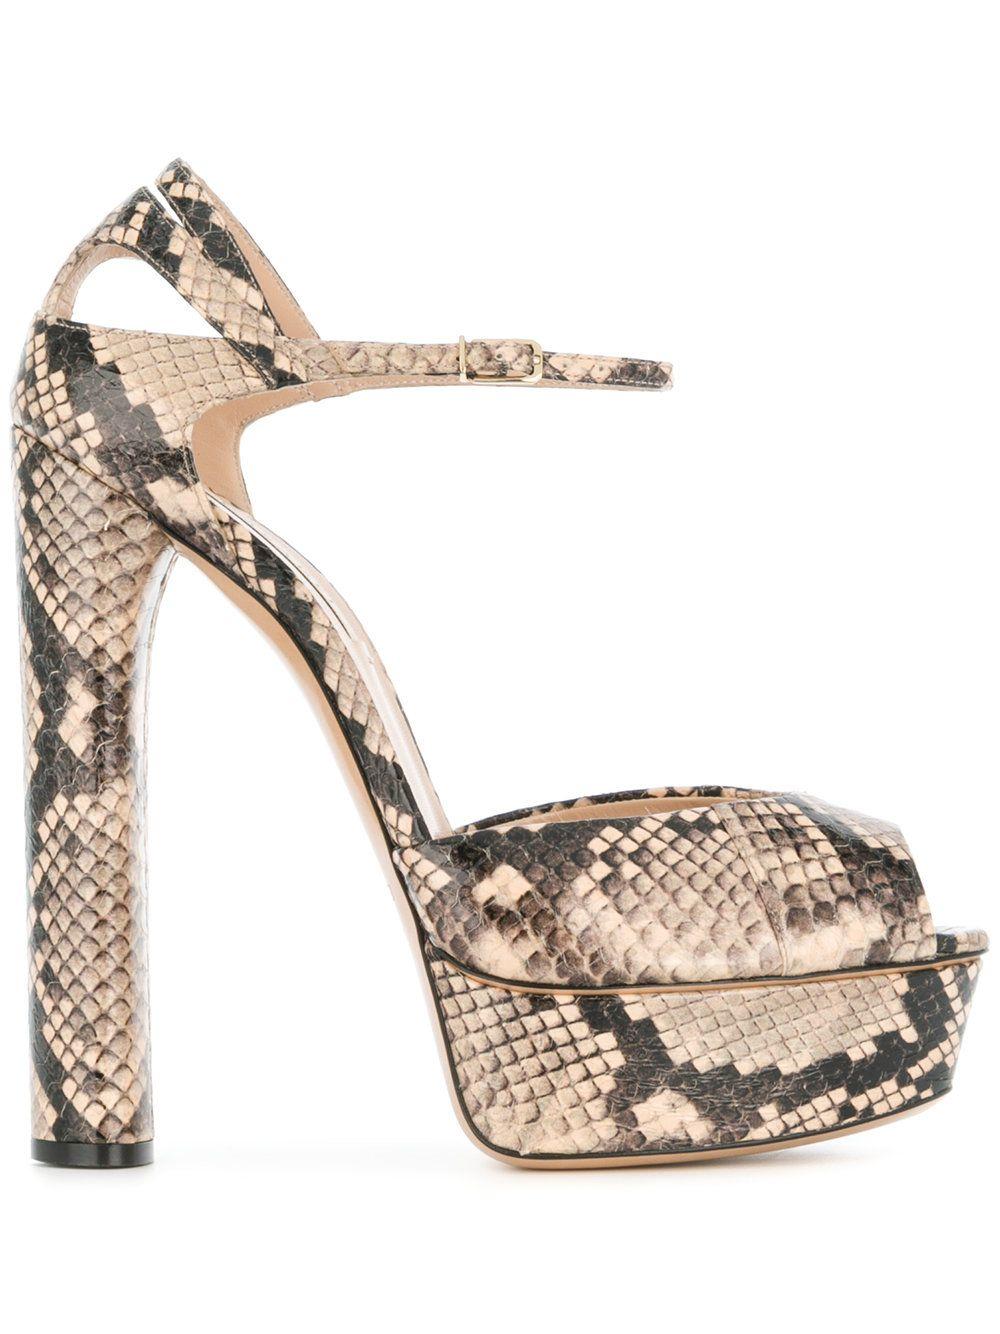 f78730c07e1 Casadei Platform Sandals - Farfetch